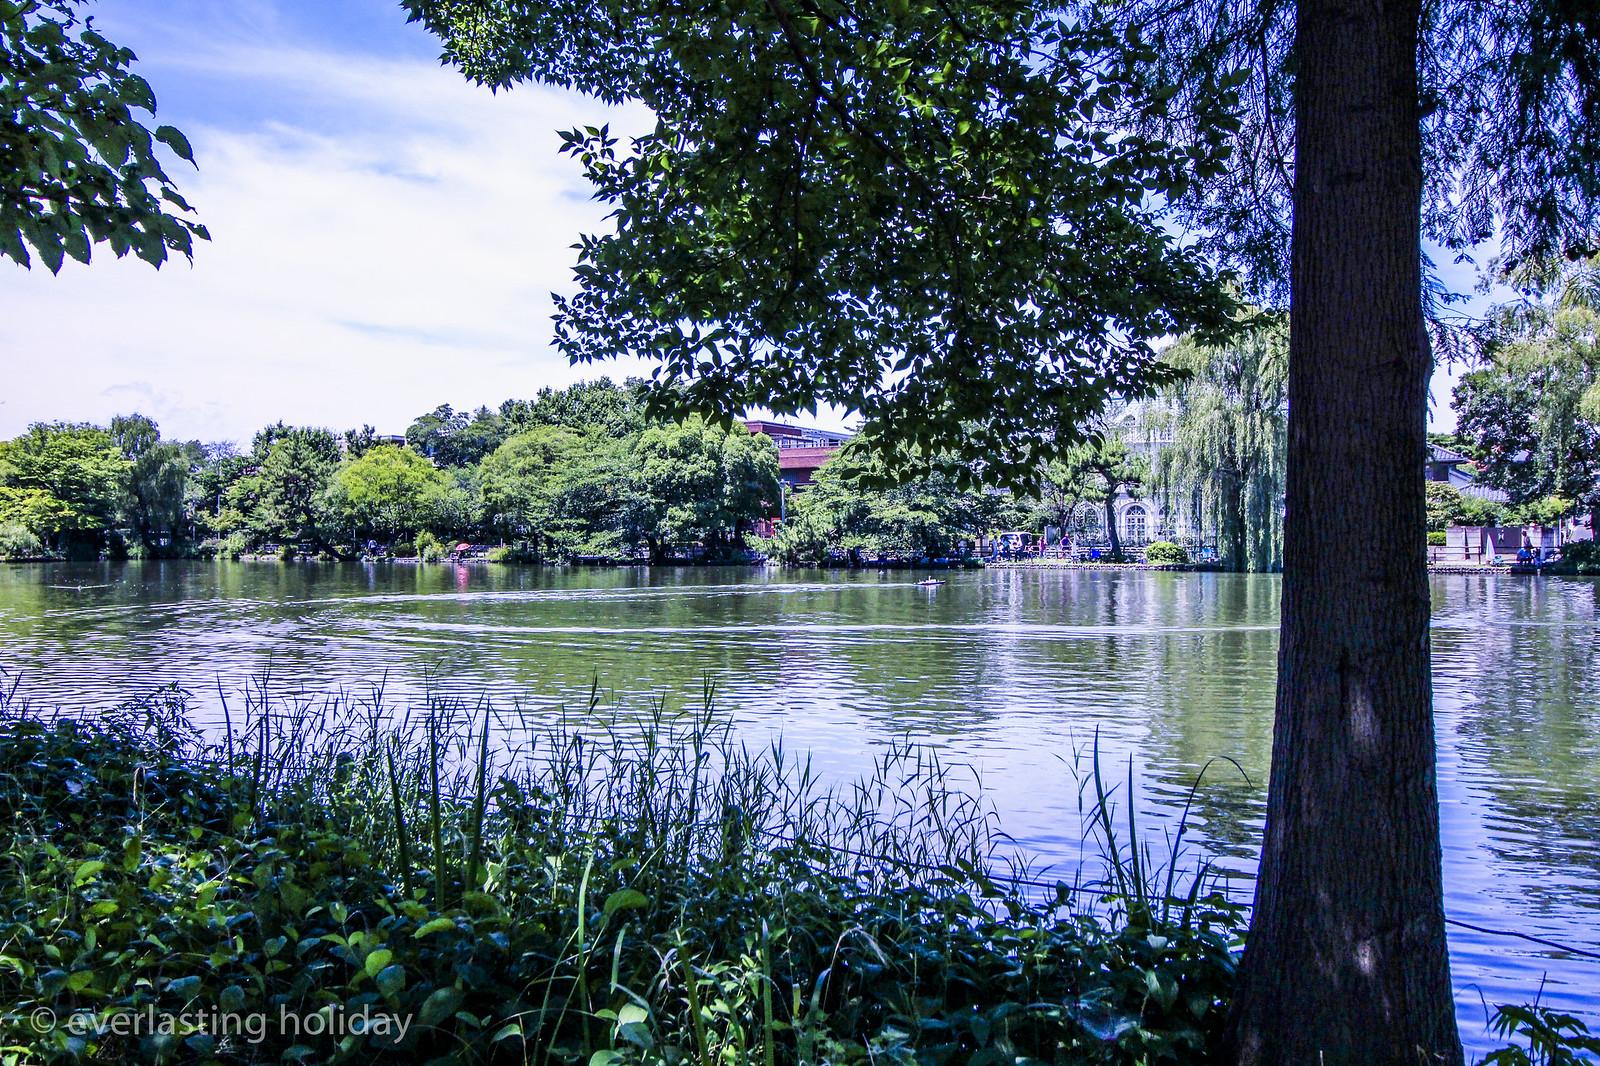 石神井公園 Shakujii Park-0003